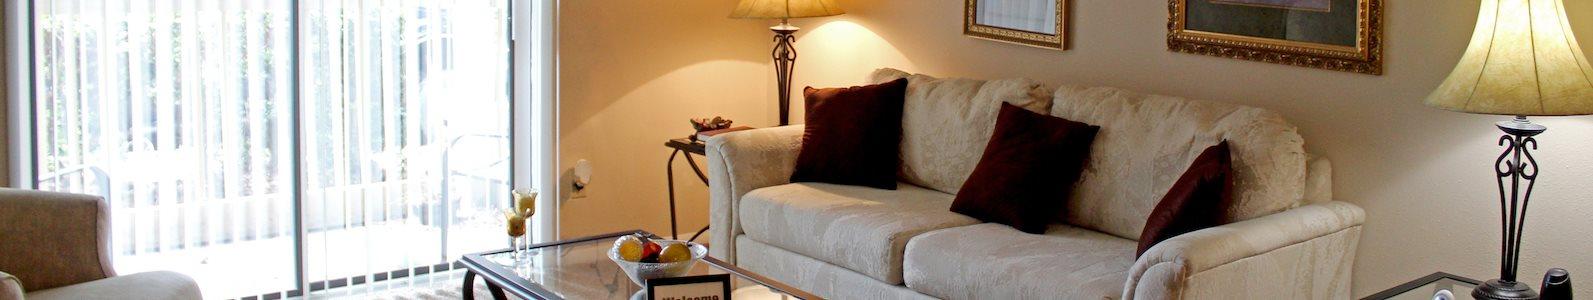 Furnished model living room with large sliding glass doors